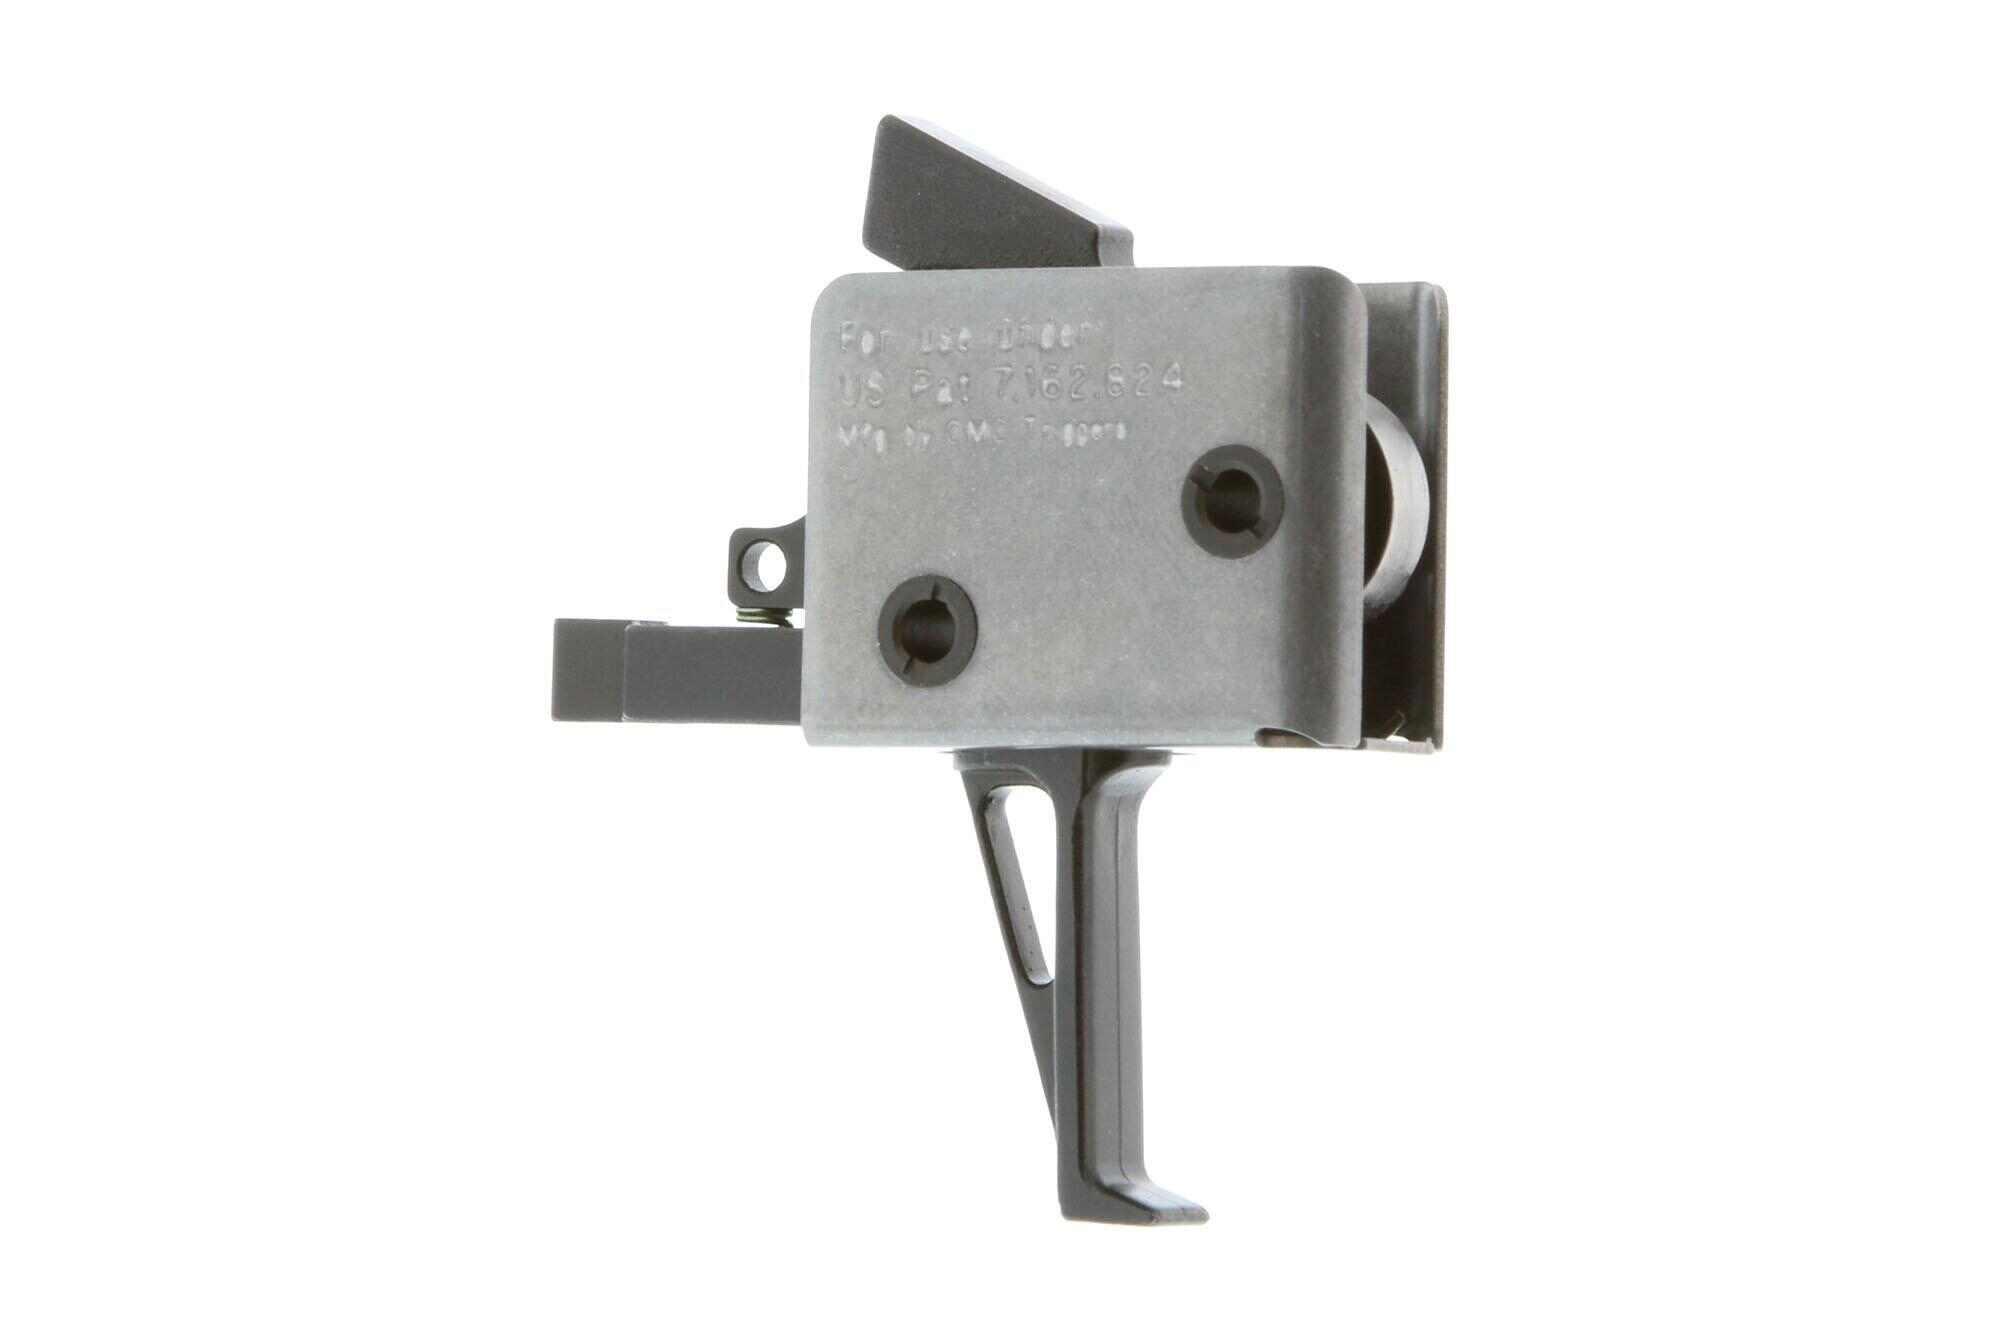 Ar-15 triggers